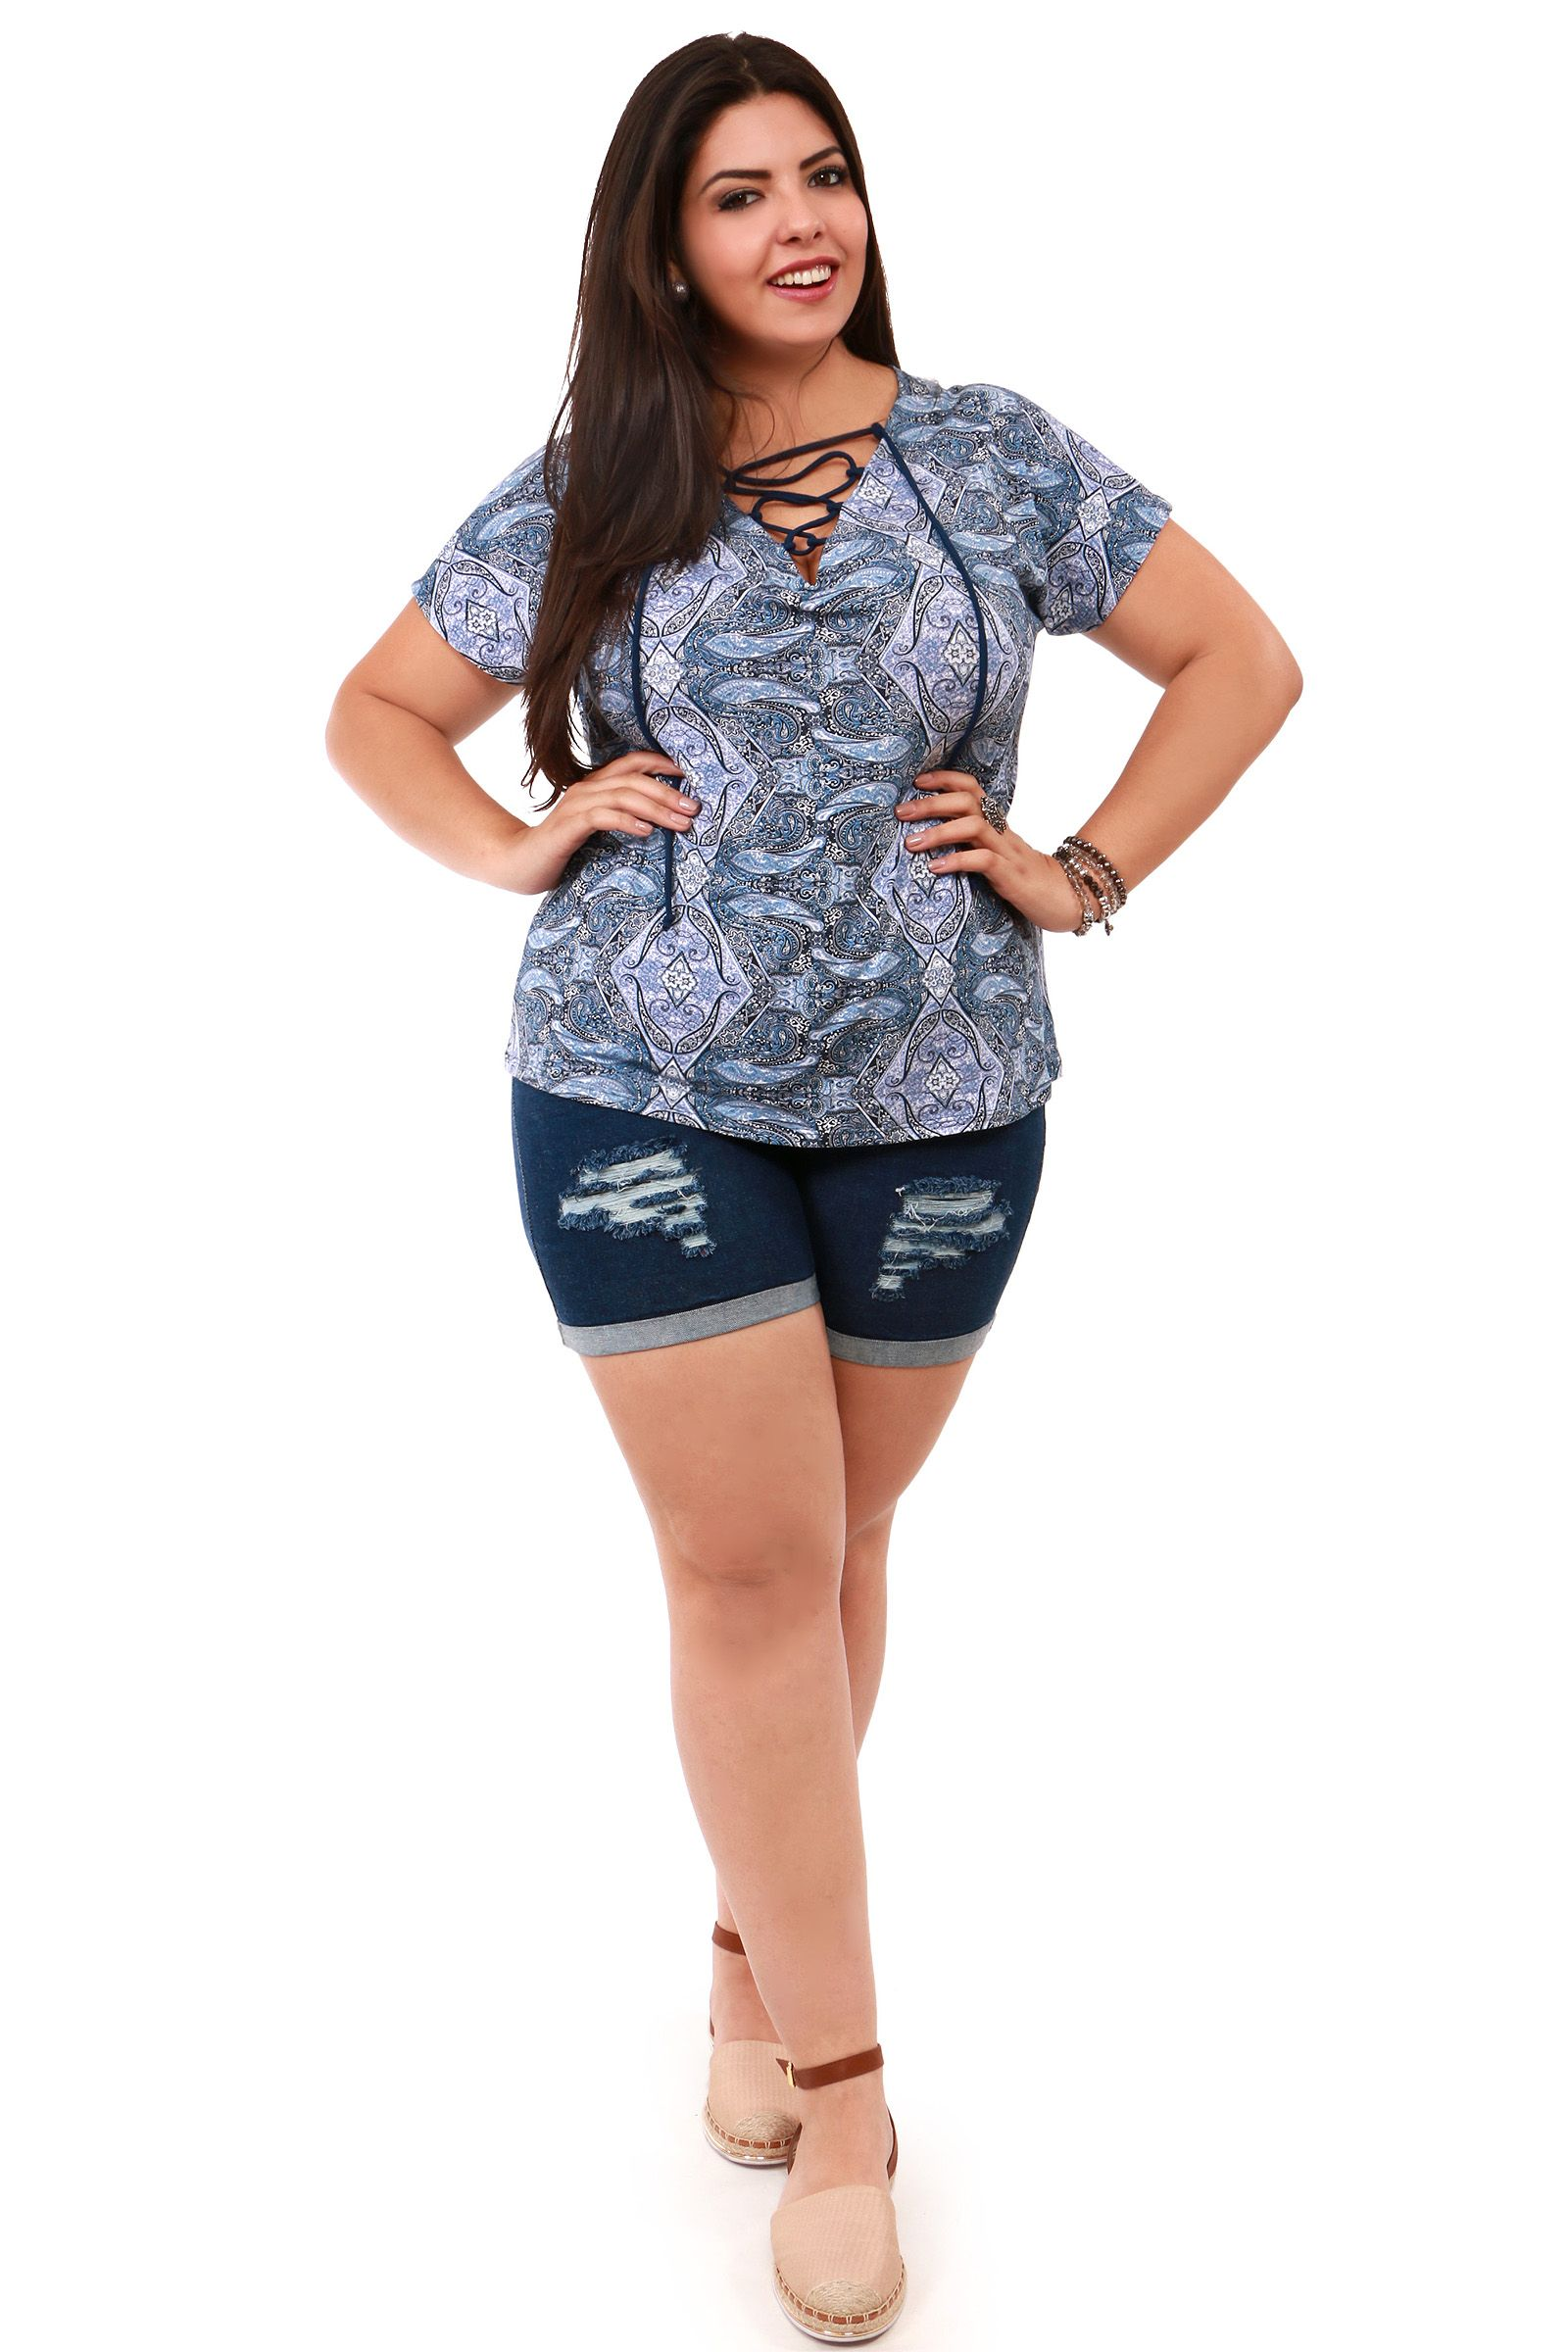 2d7af42d4def Shorts rasgado Plus Kauê   Moda Plus Size -Shorts em alta kauê ...